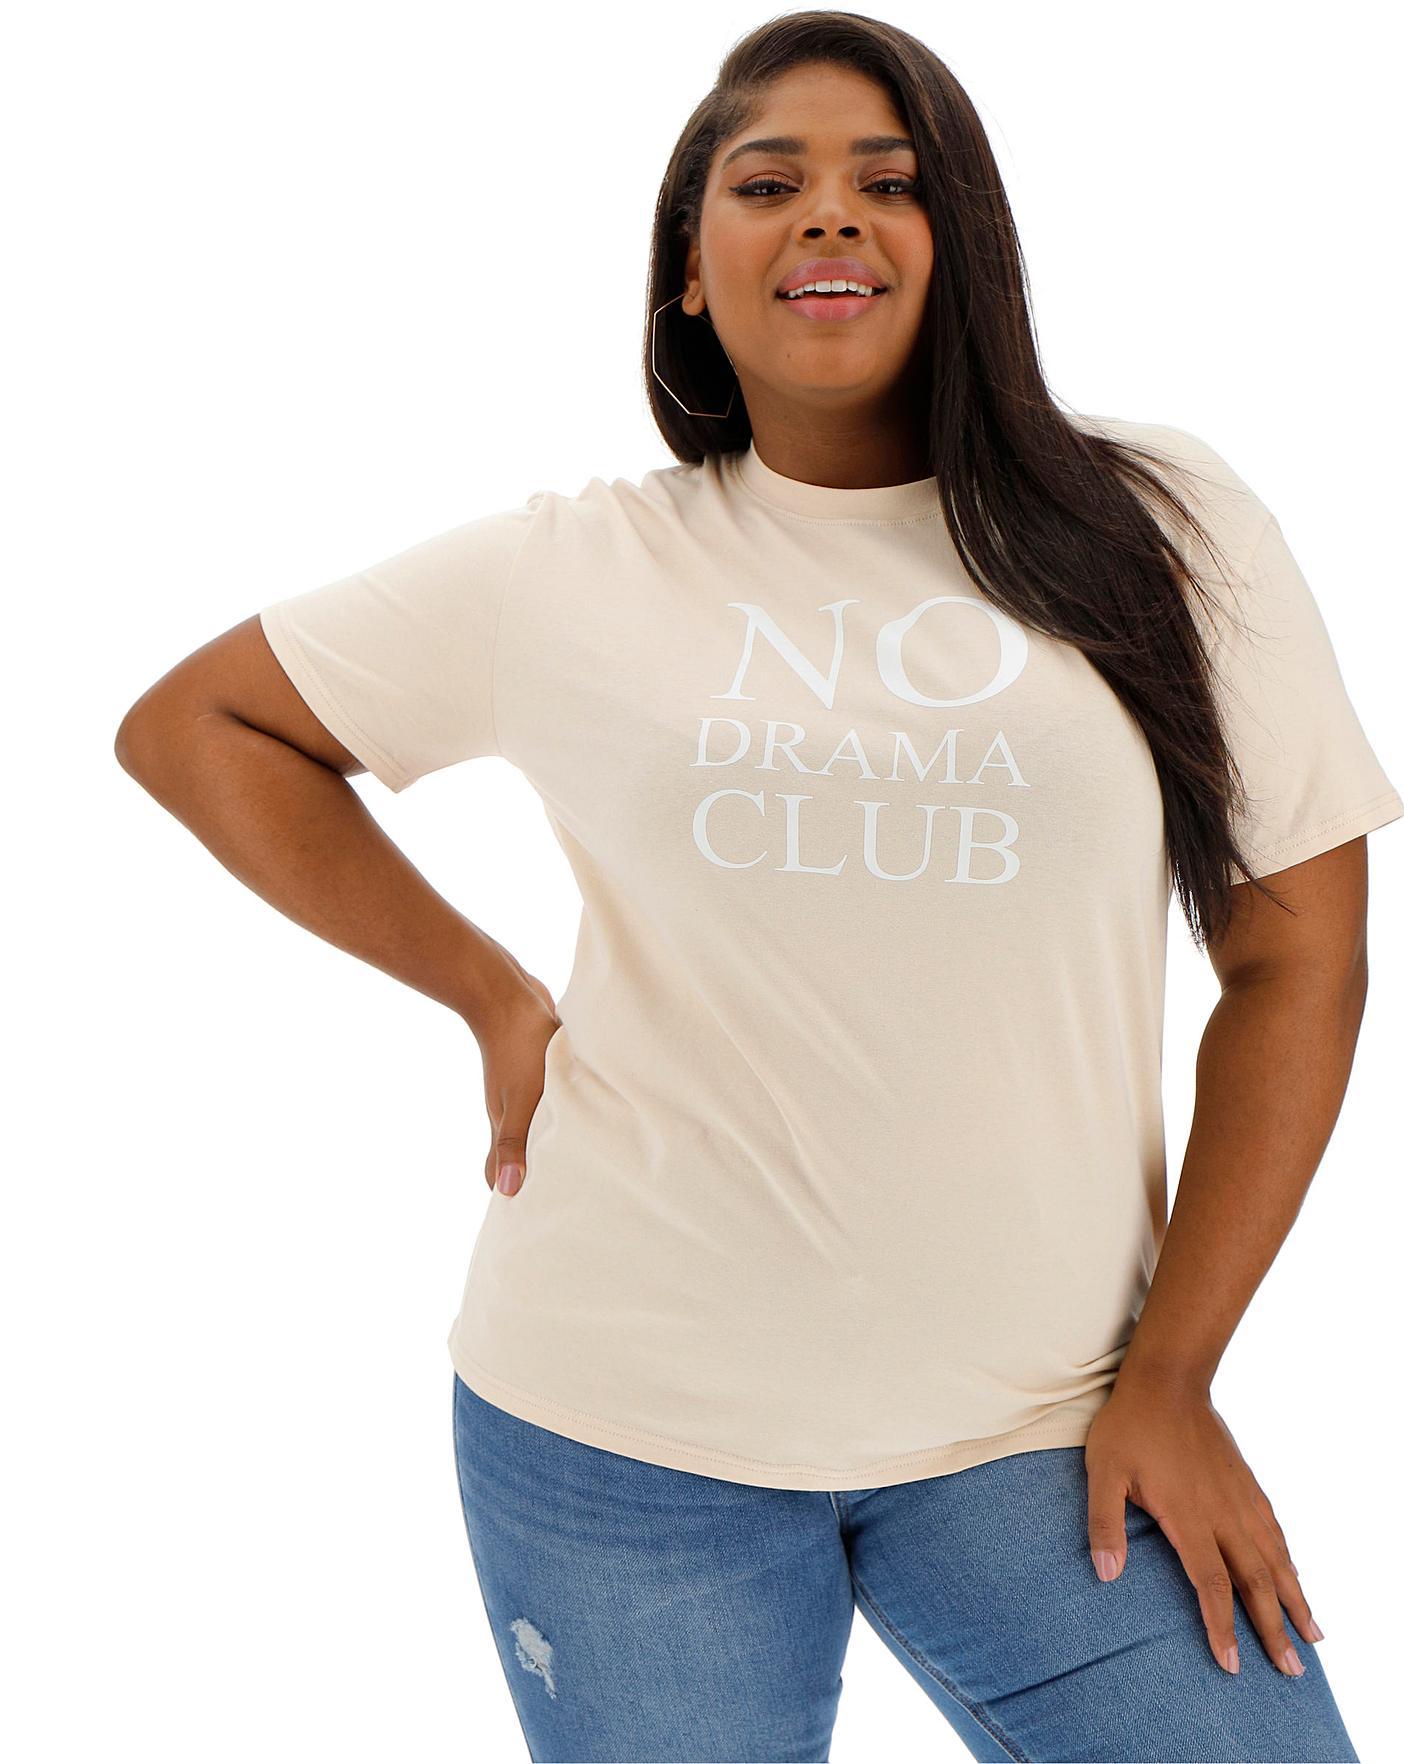 Lasula No Drama Club Slogan Tshirt Crazy Clearance